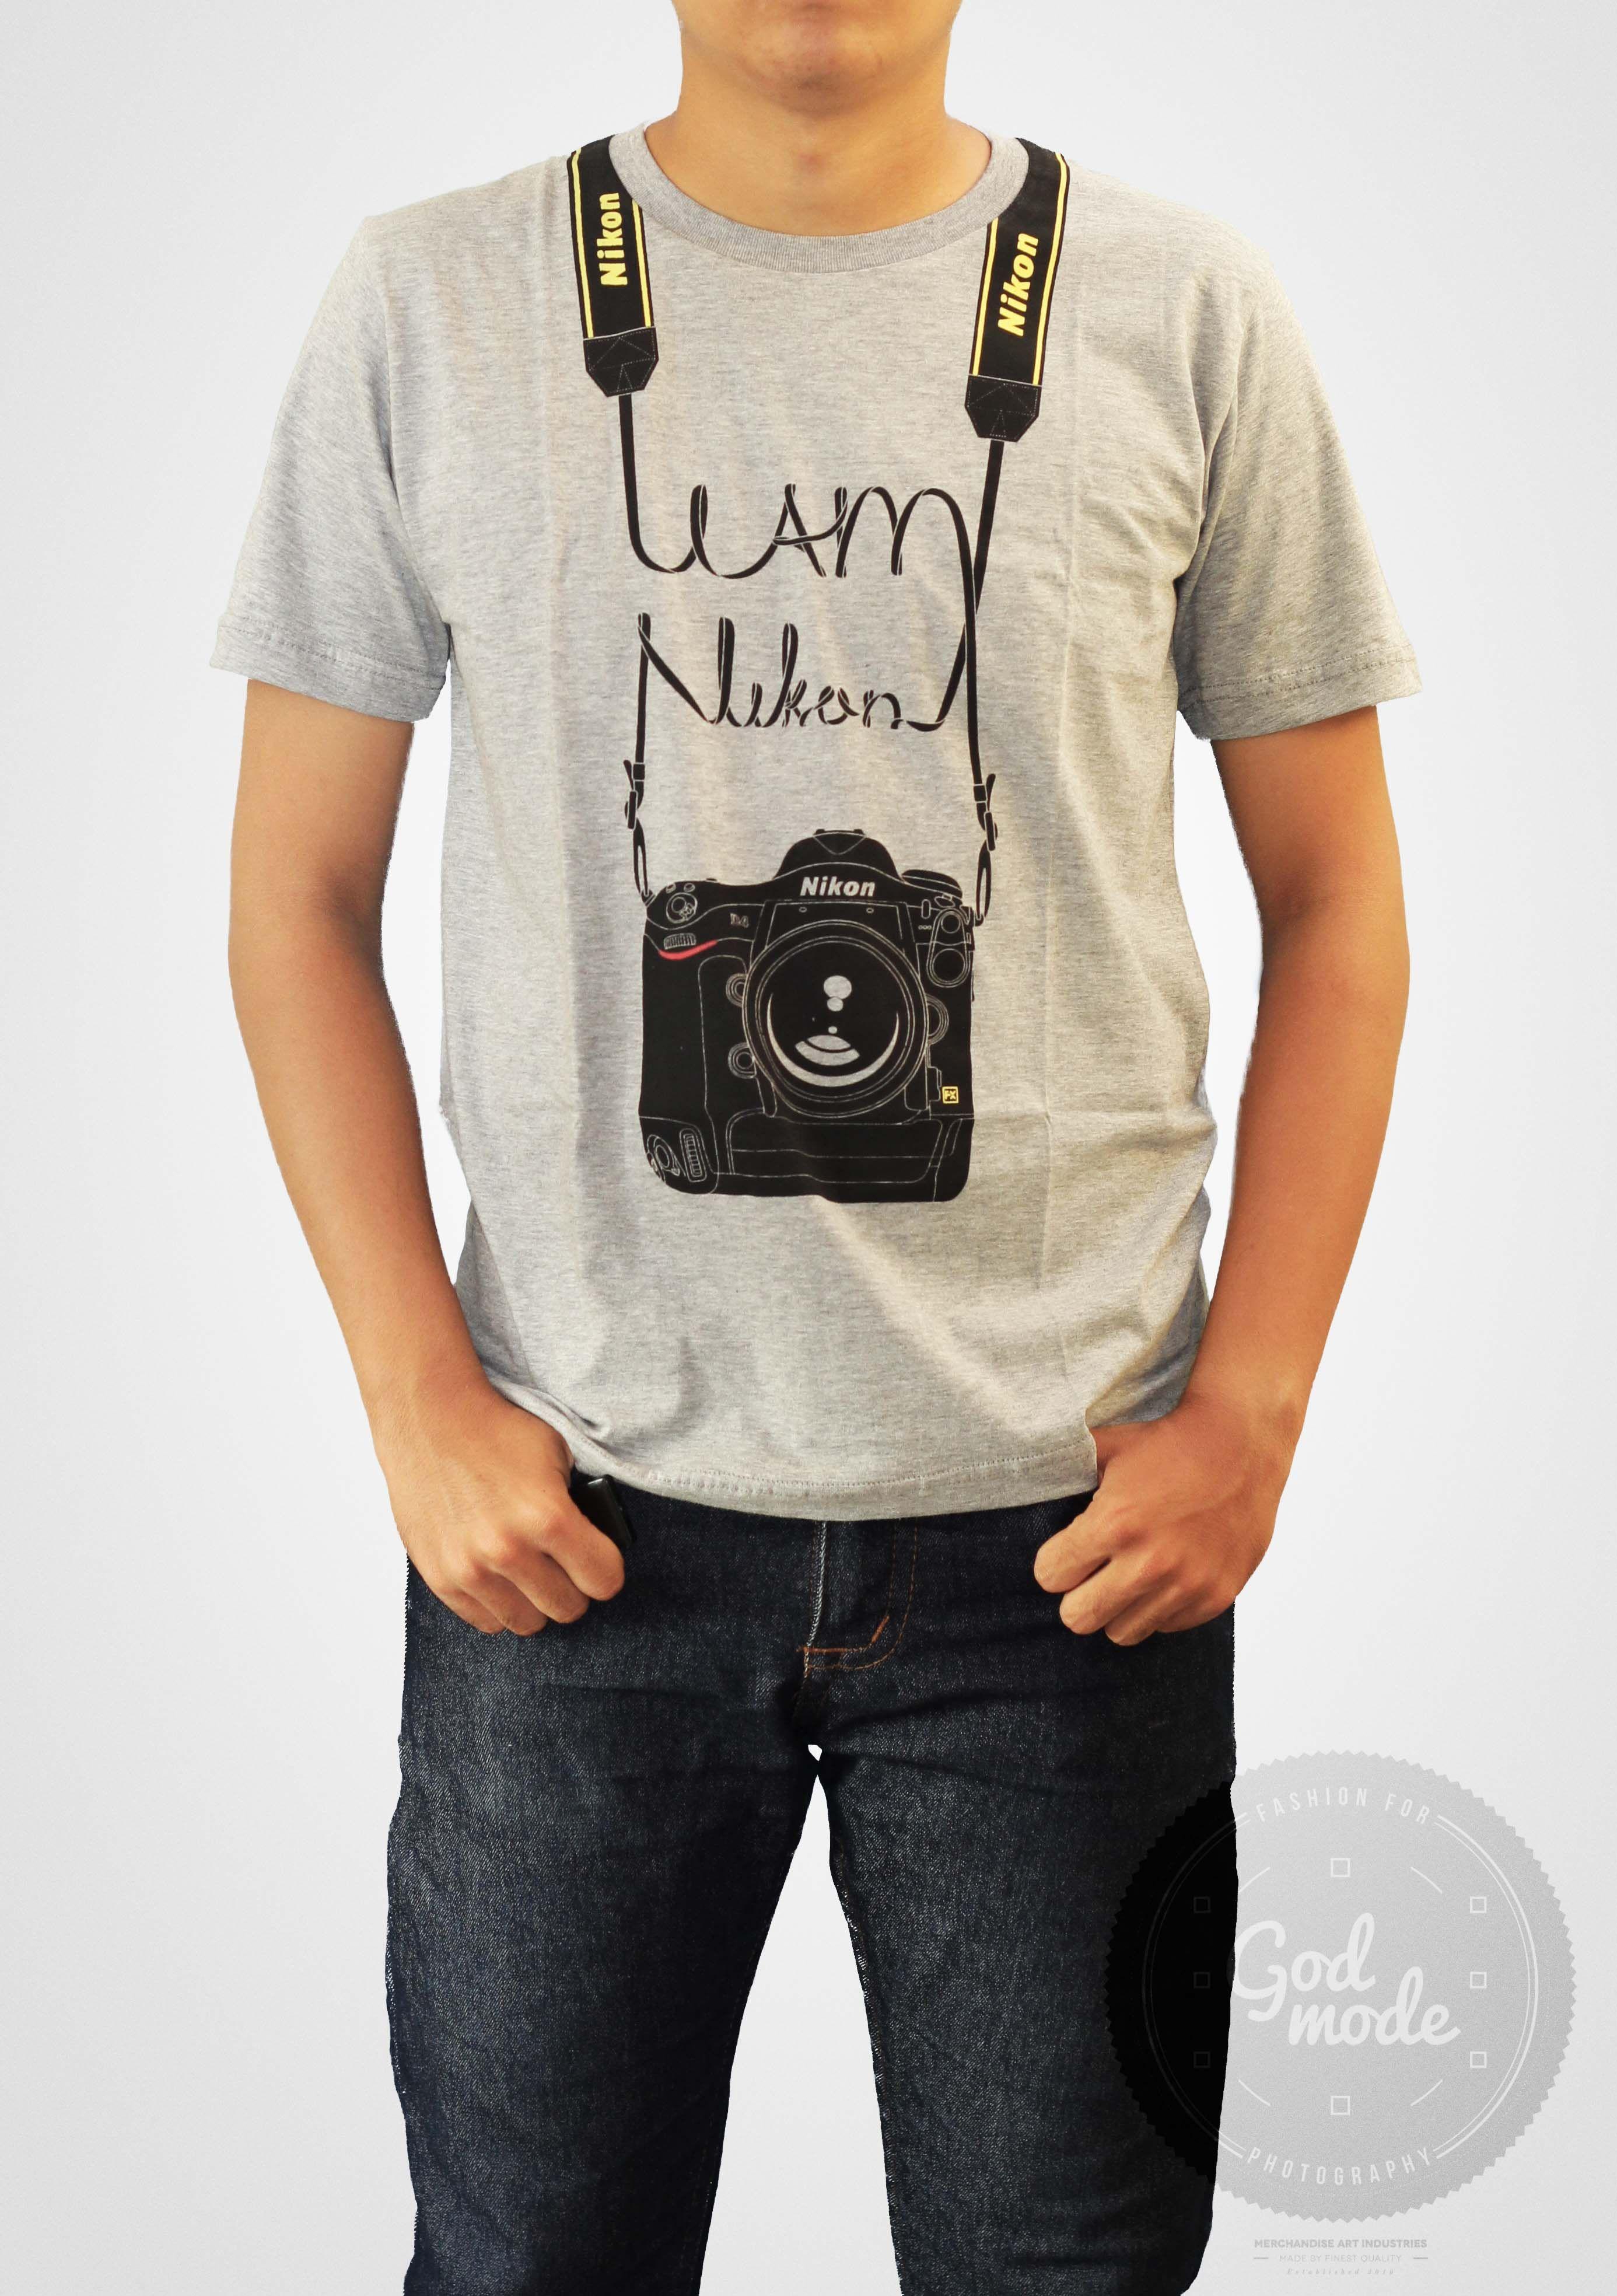 Usd Nikon T Shirt T-shirts